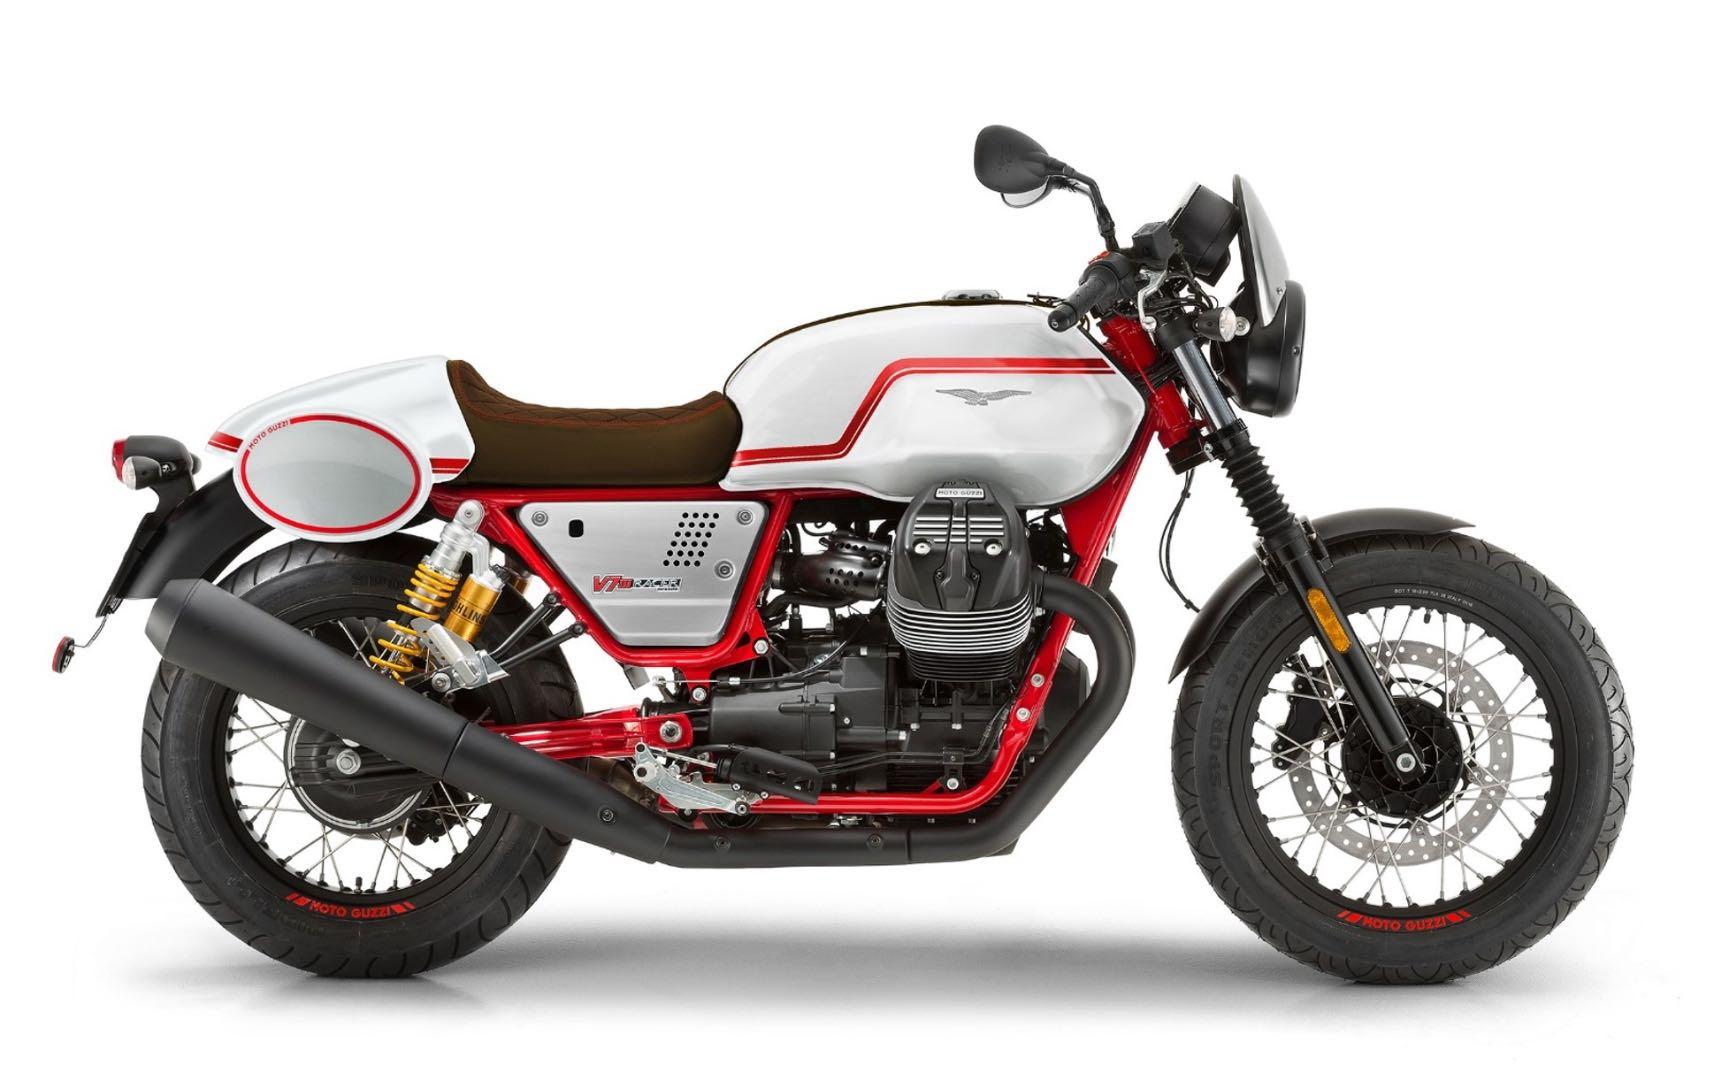 Moto Guzzi V7 III Racer retro motorcycle